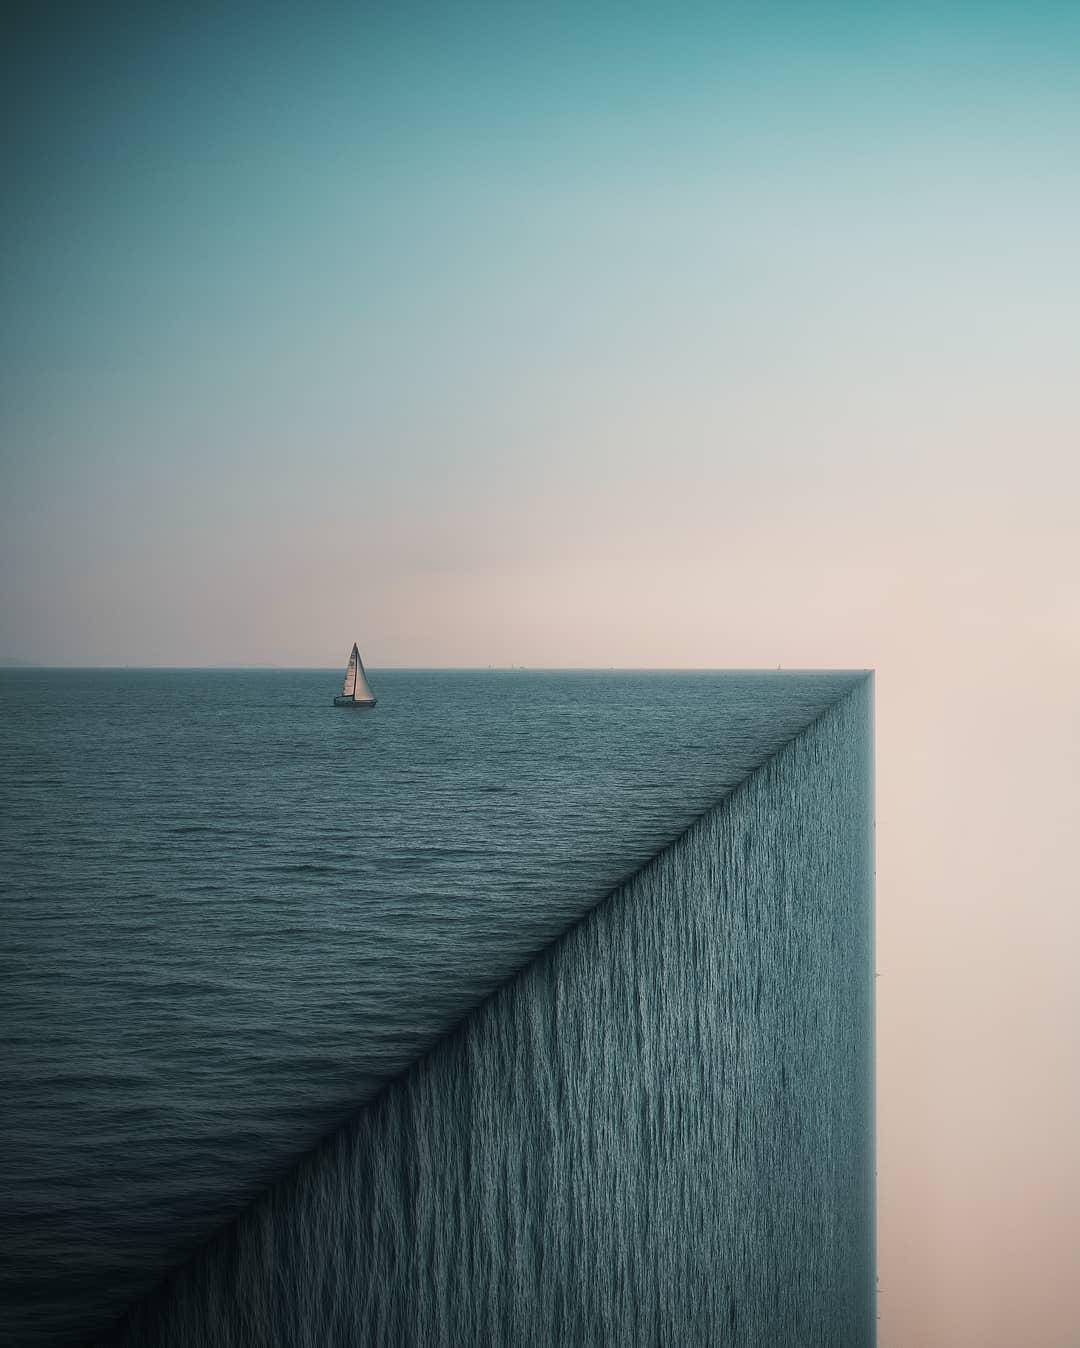 fallen ocean world photoshop edit